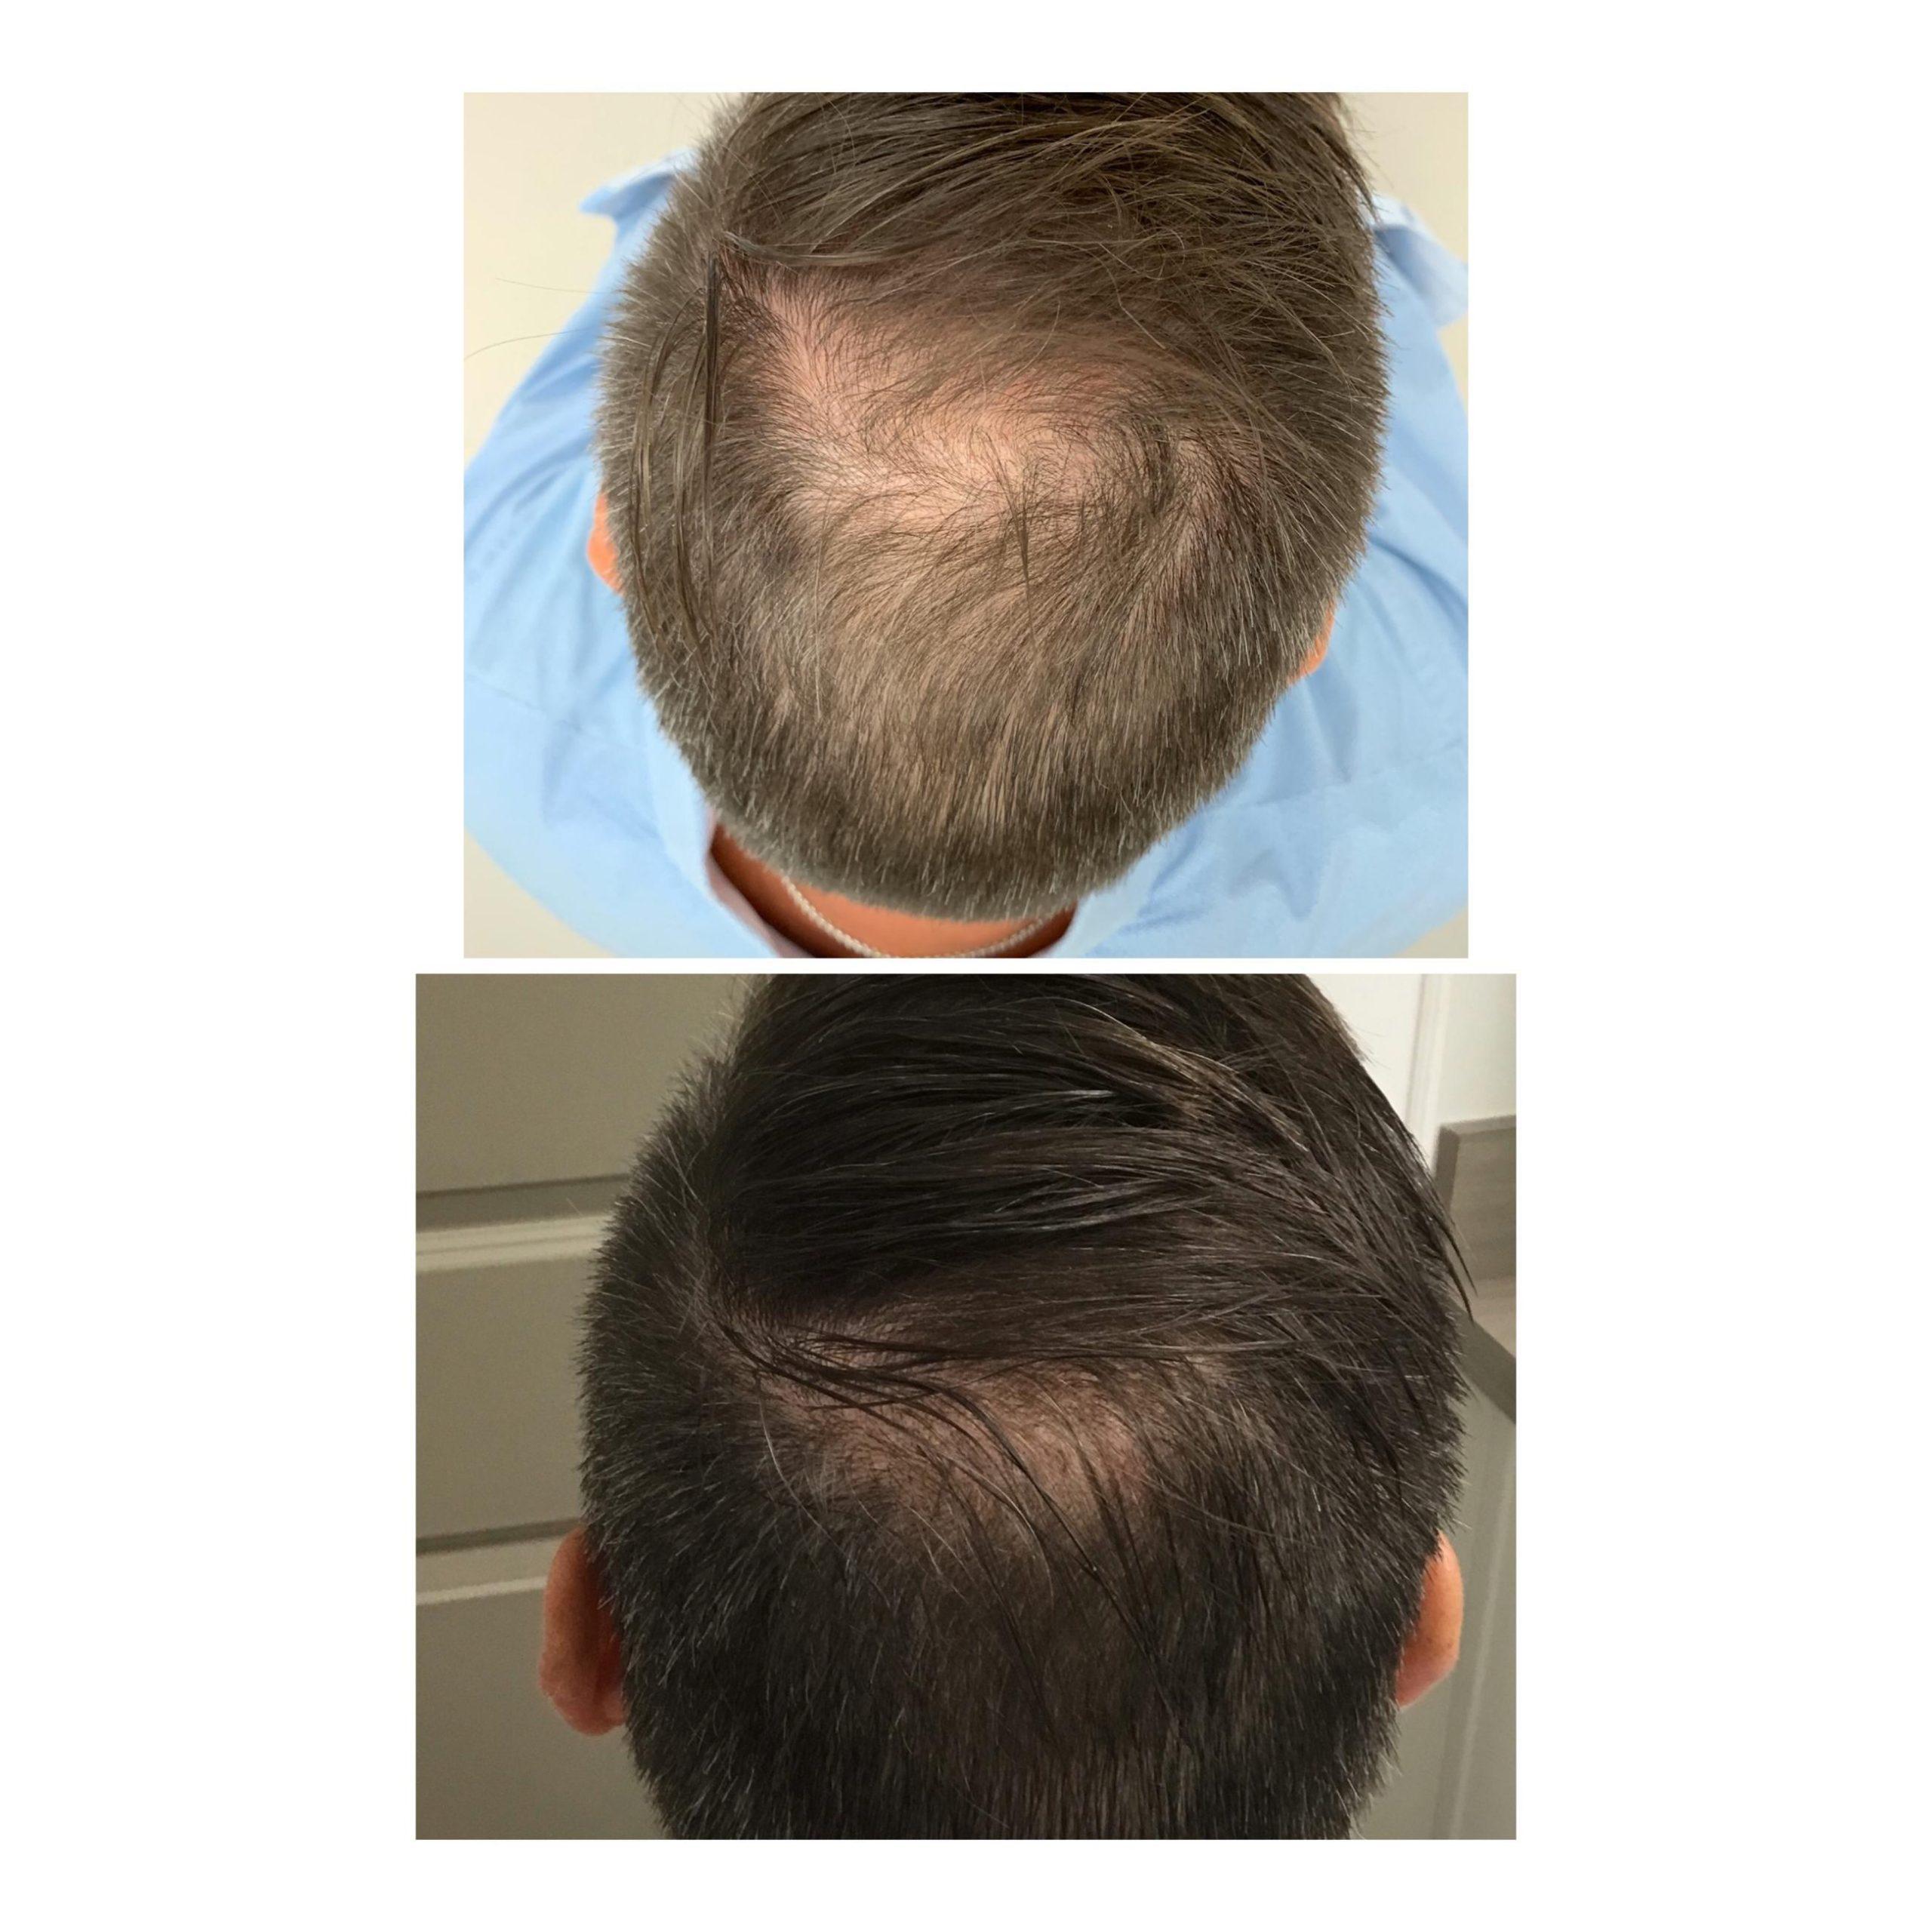 exosomes-hair-regeneration-30-days-after-not-prp-hair-restoration